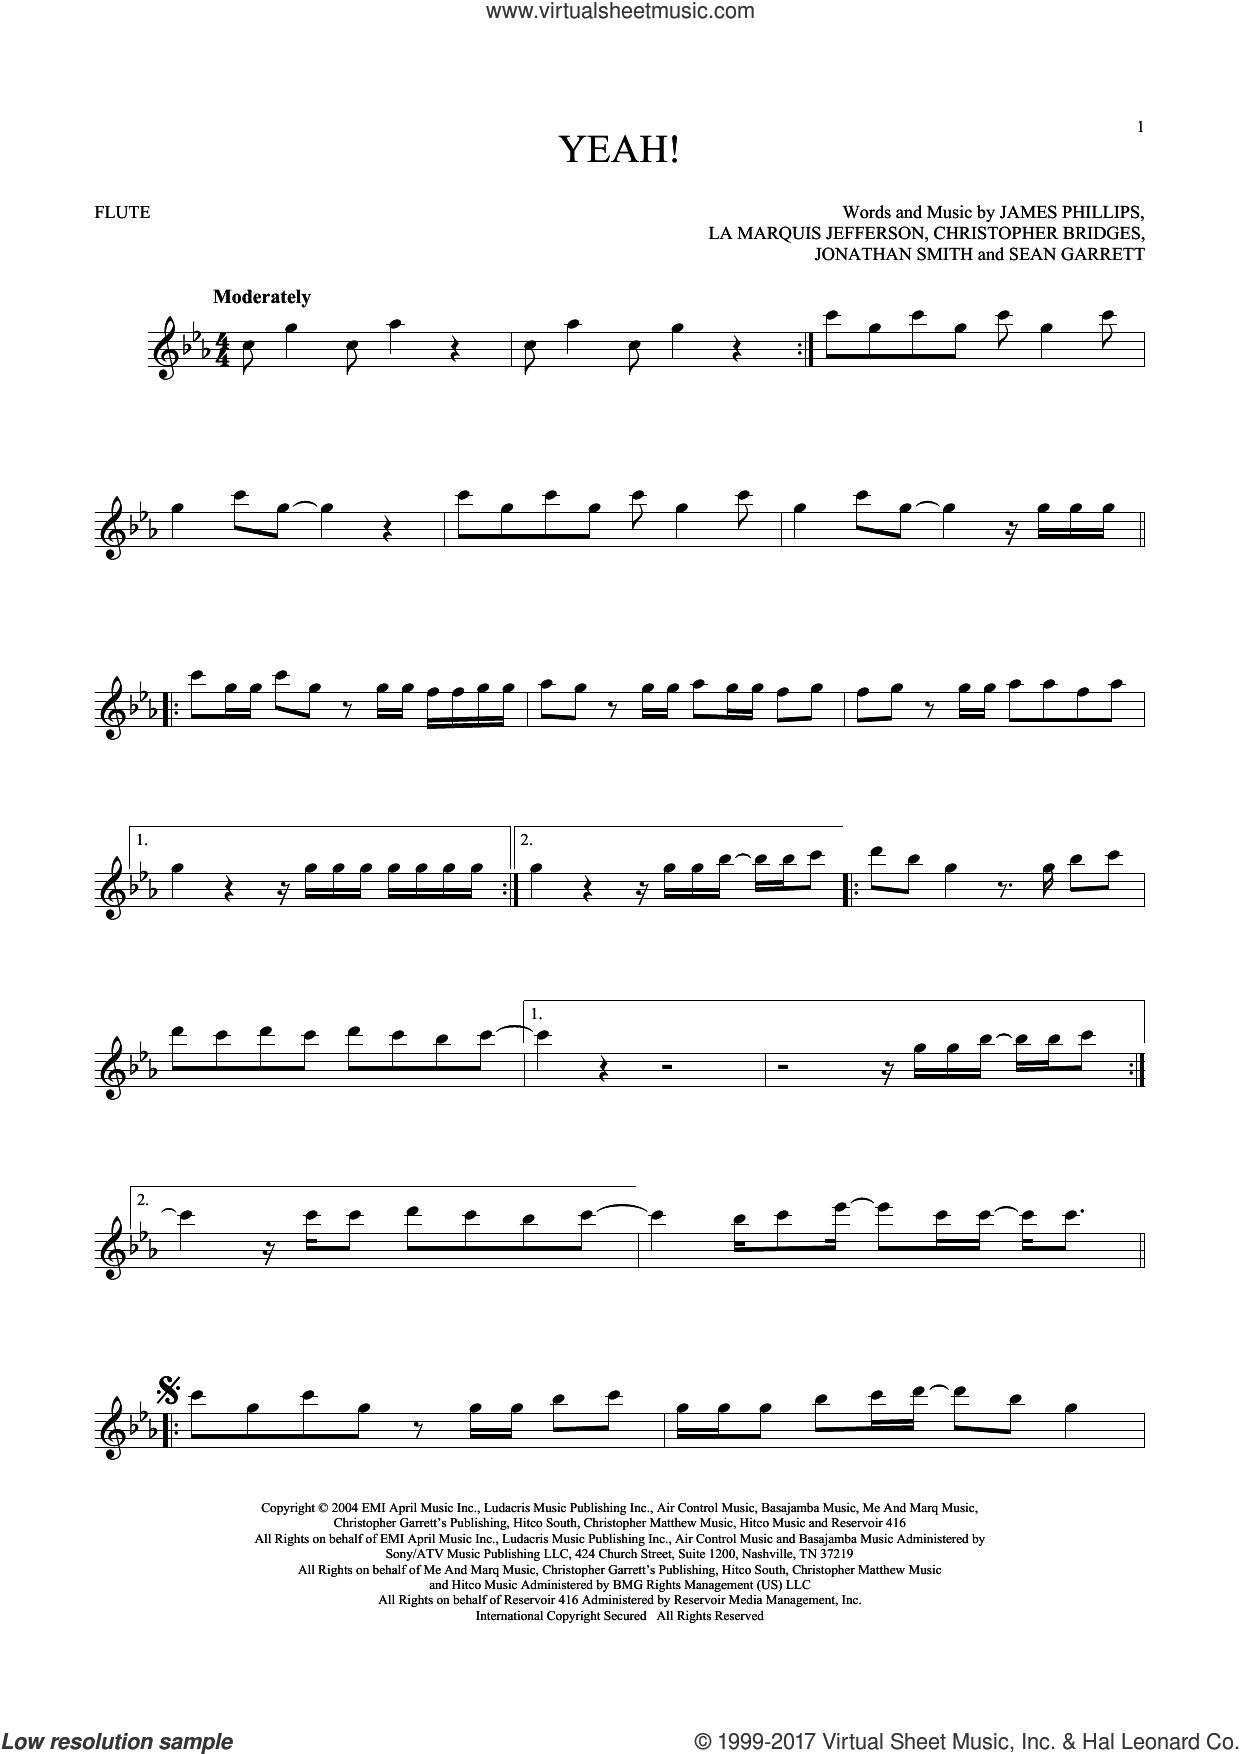 Yeah! sheet music for flute solo by Usher featuring Lil Jon & Ludacris, Christopher Bridges, James Phillips, Jonathan Smith, La Marquis Jefferson, Laurence Smith and Sean Garrett, intermediate skill level